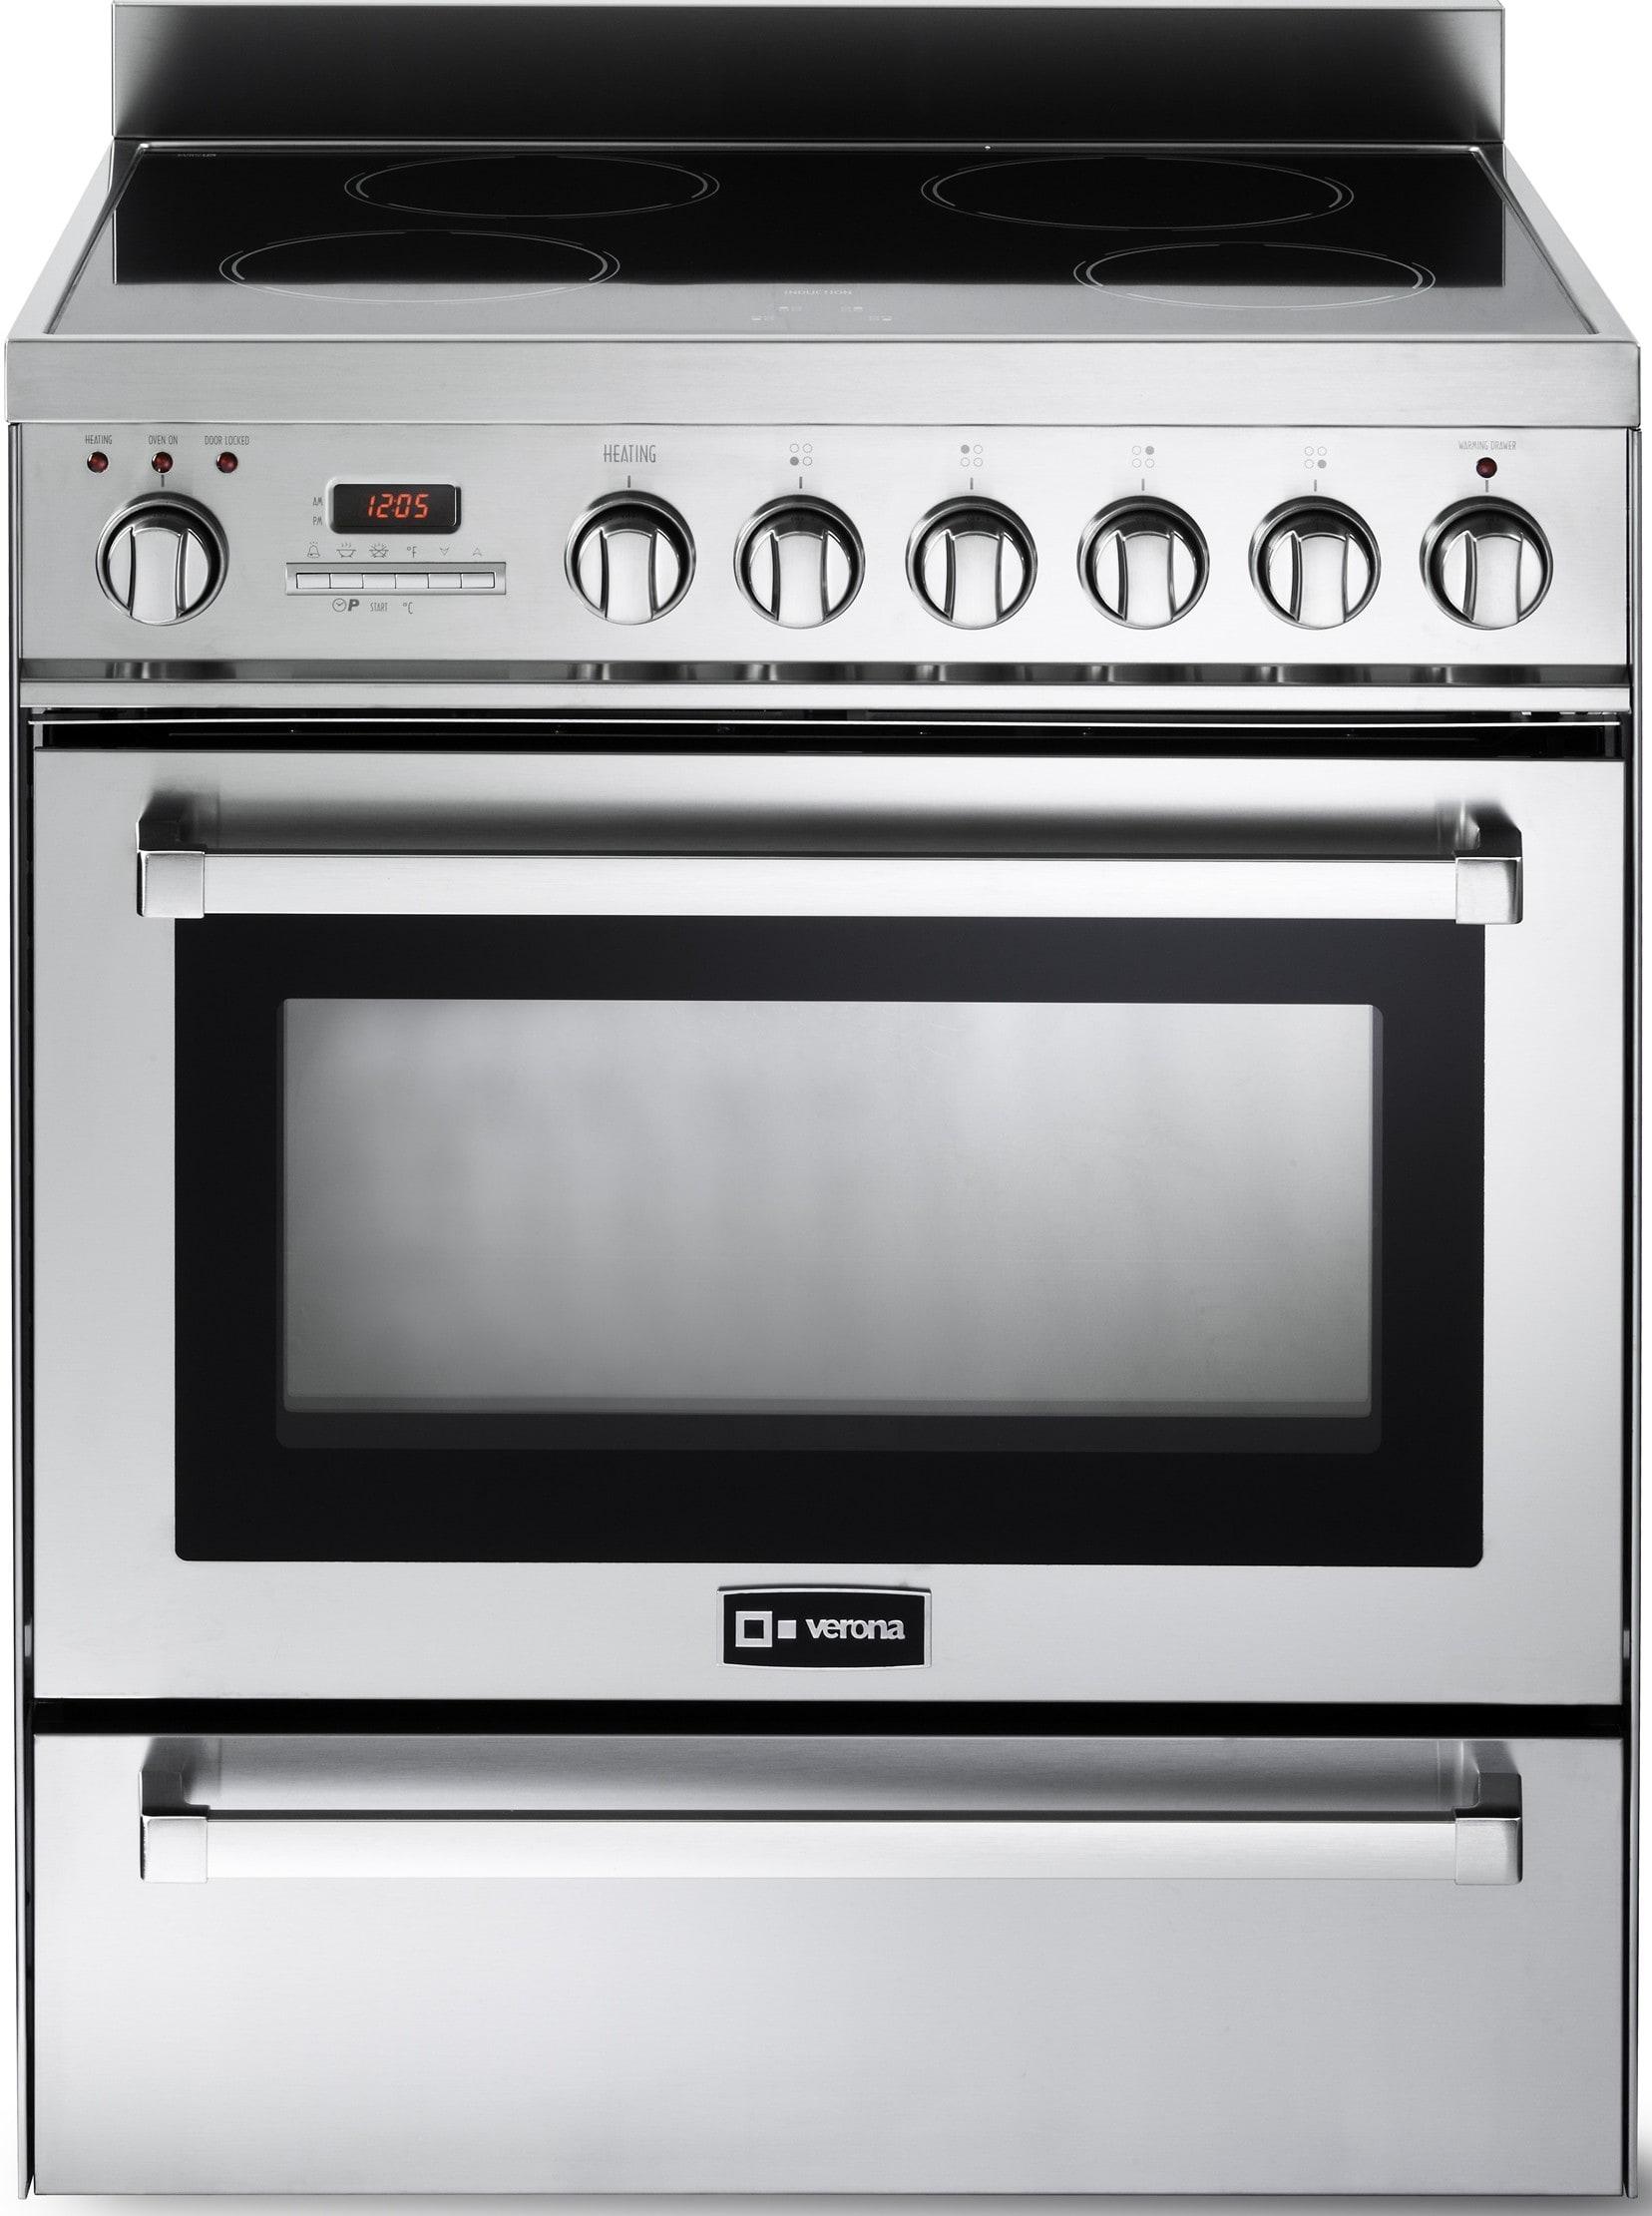 Induction Cooking Ranges ~ Verona vefsie pss inch freestanding induction range